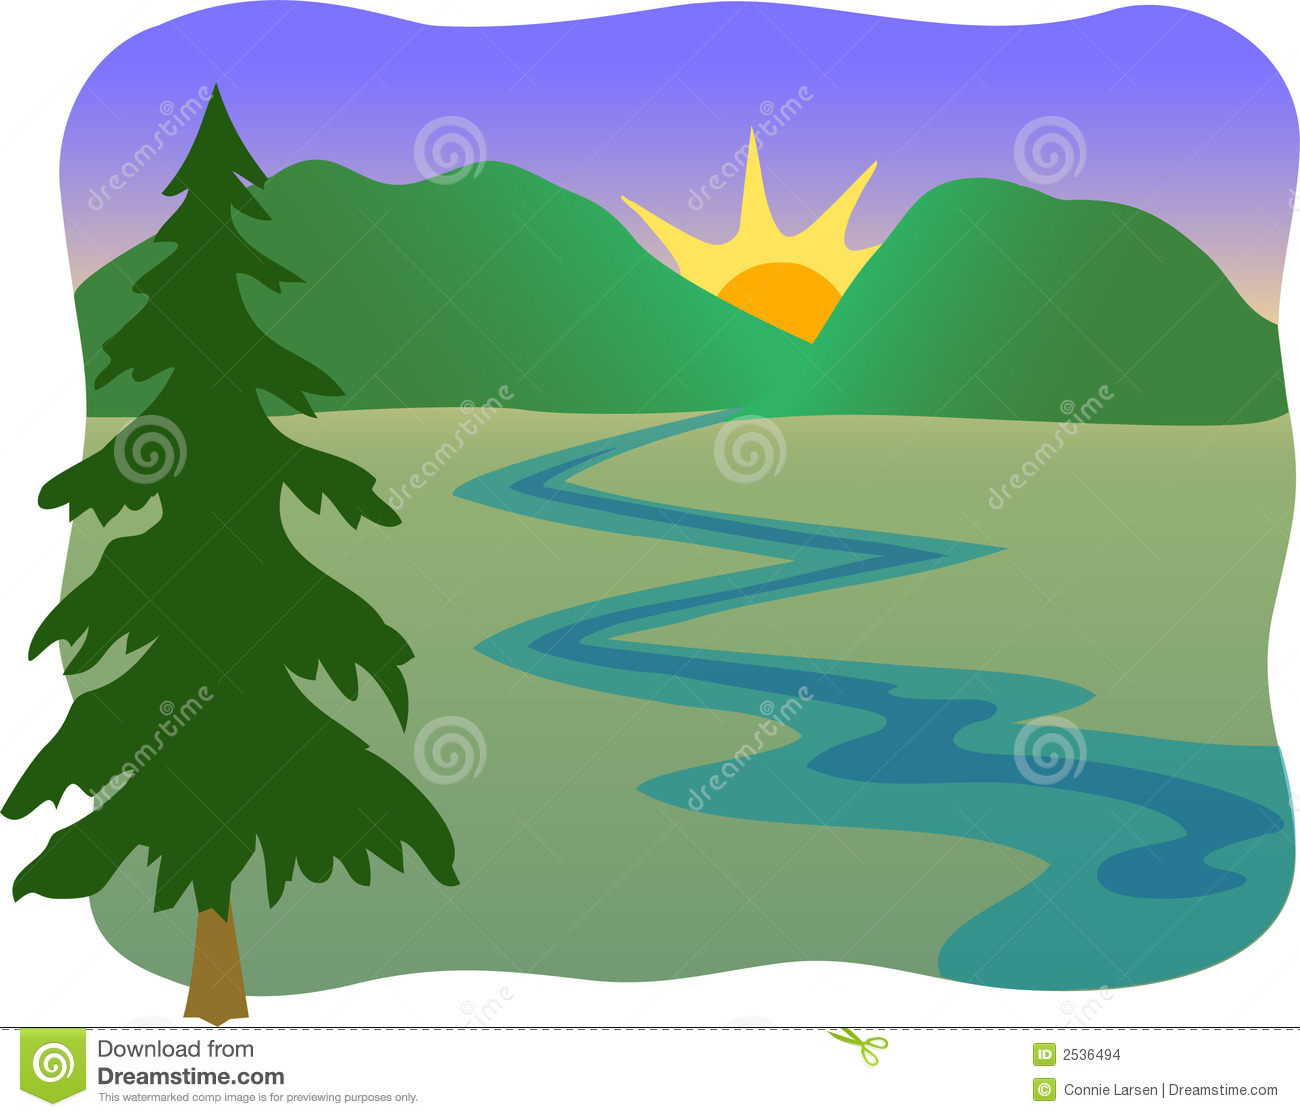 Mountain stream clipart.